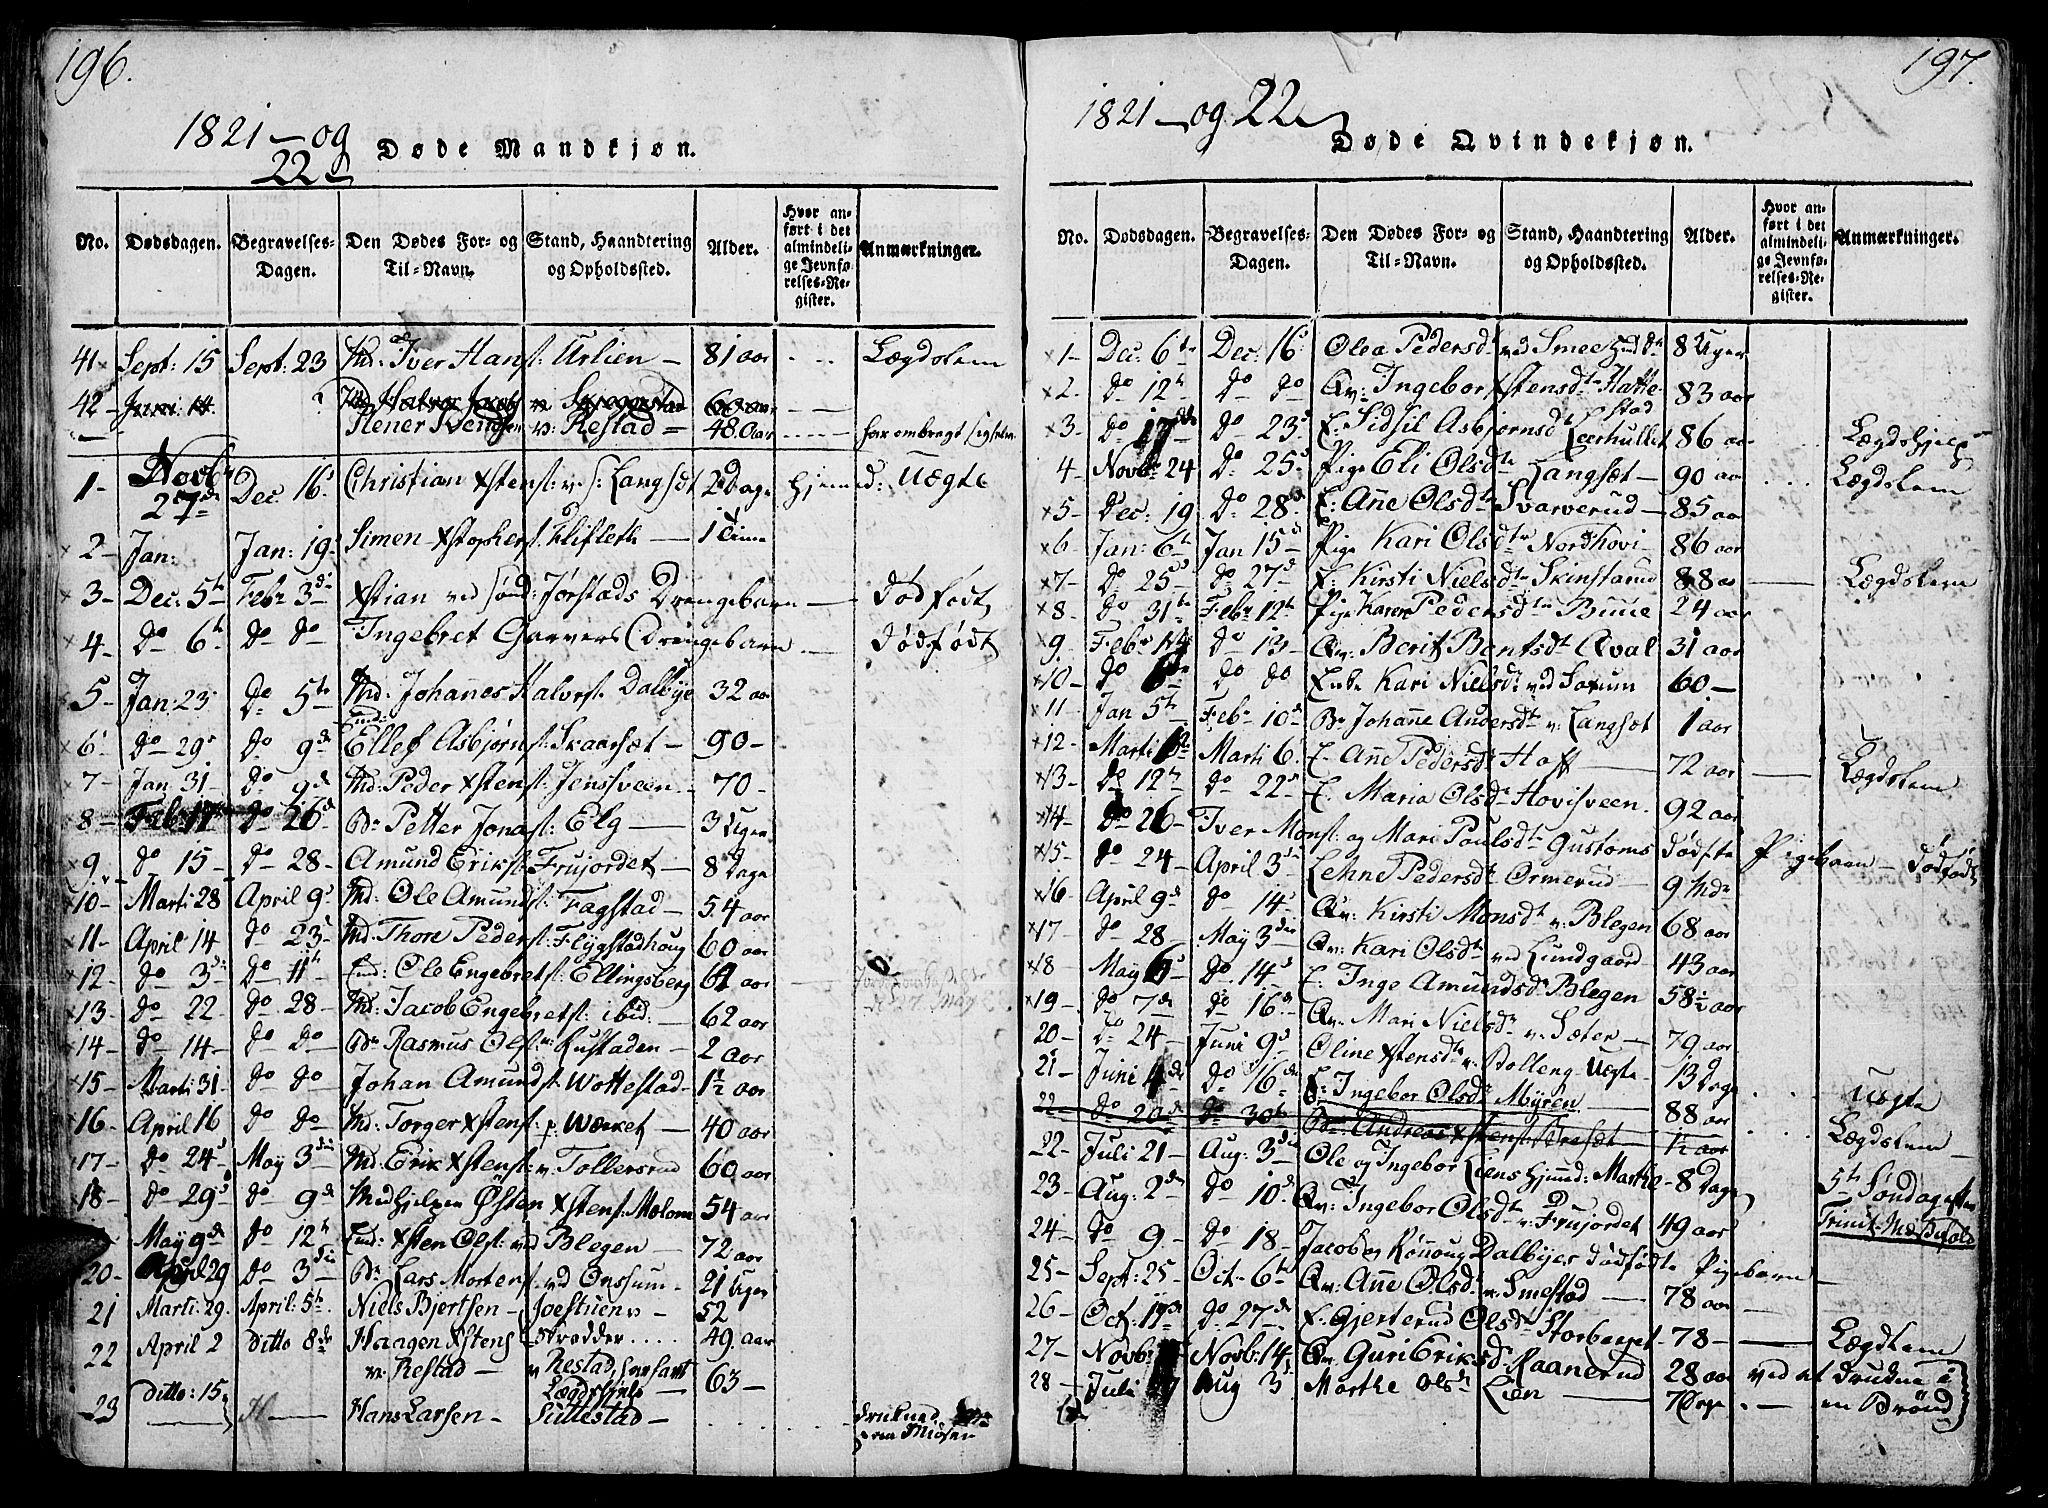 SAH, Fåberg prestekontor, Klokkerbok nr. 4, 1818-1837, s. 196-197